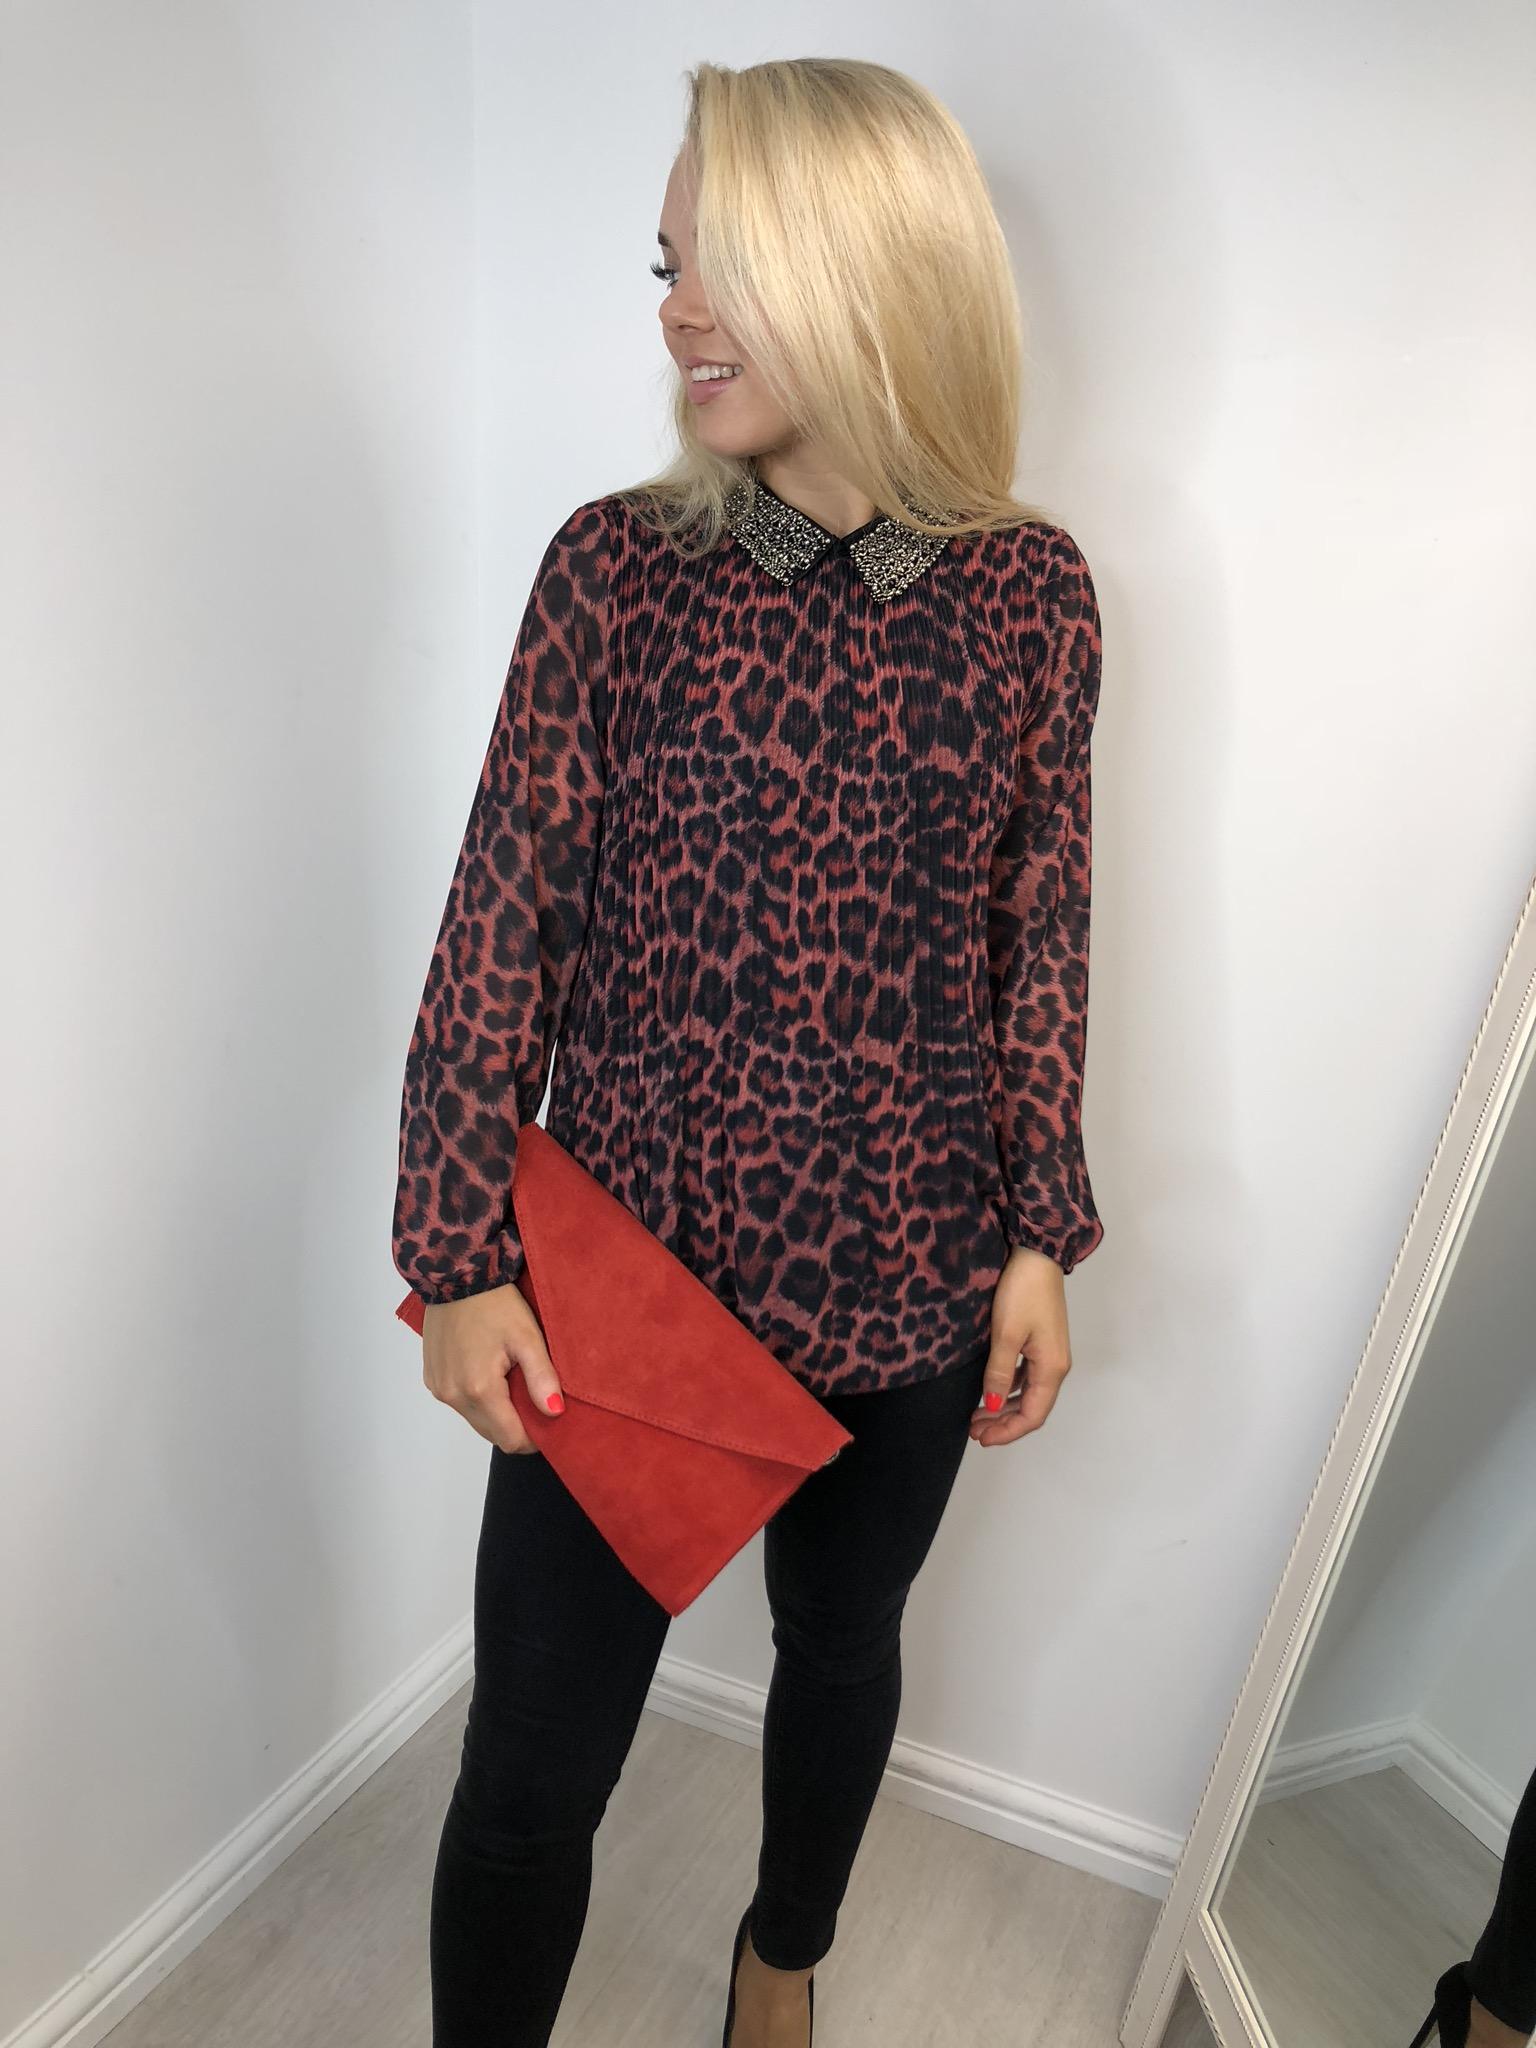 Zara Leopard Print Beaded Top